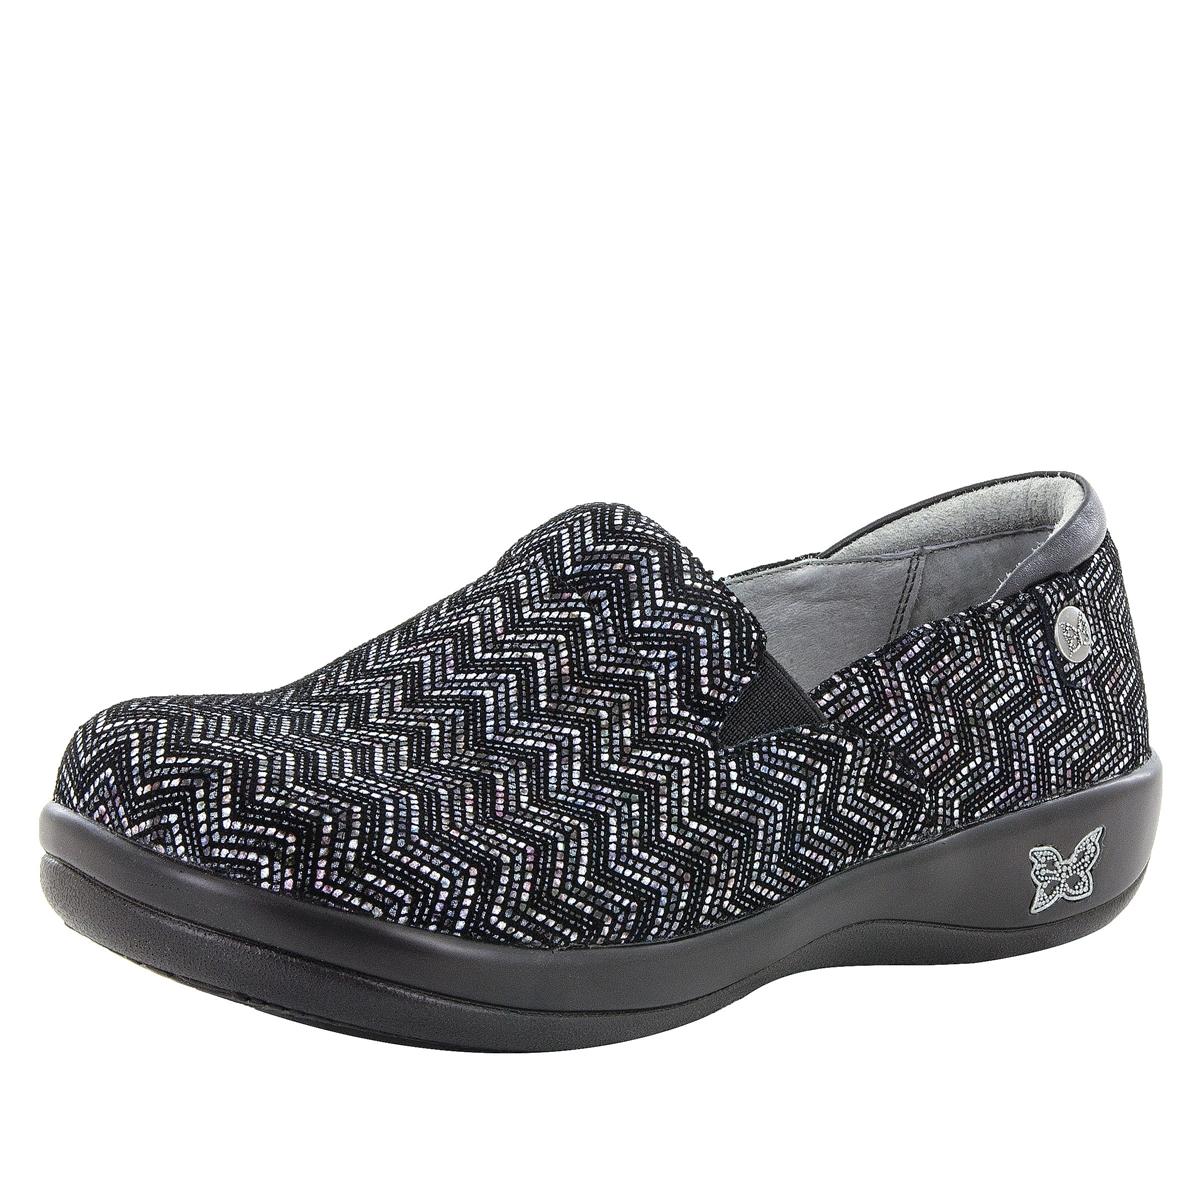 Alegria Keli PRO Ric Rack womens comfort shoe · View Larger Photo Email ...